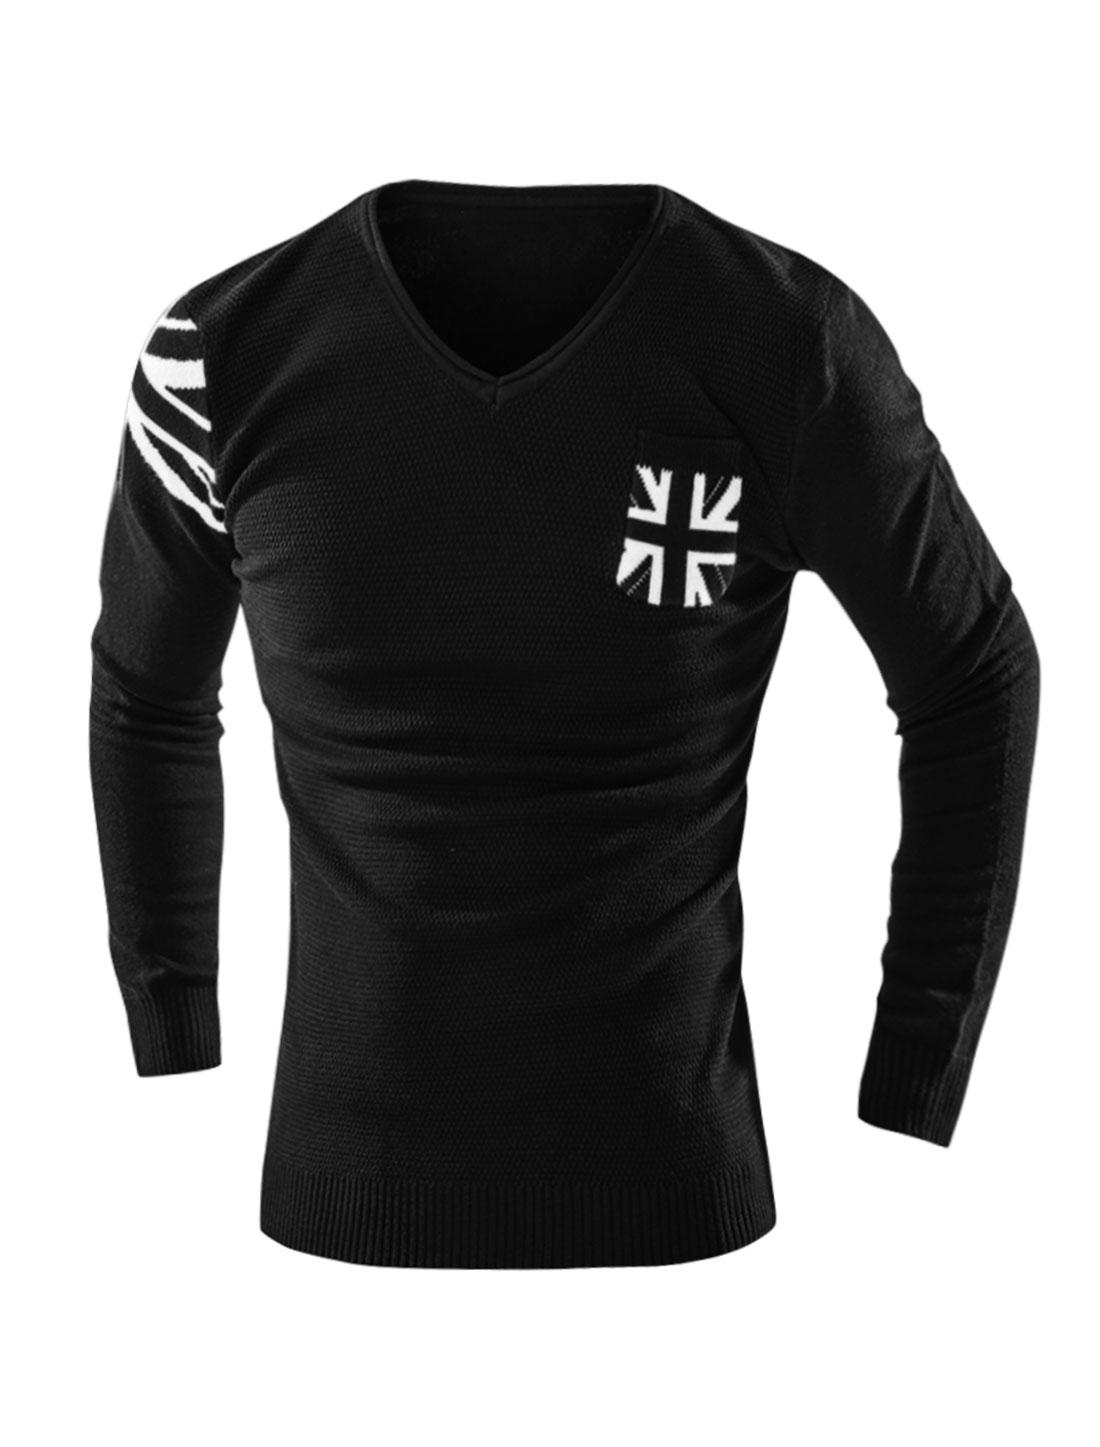 Man V Neck Union Jack Flag Knit Shirt w Pocket Black M